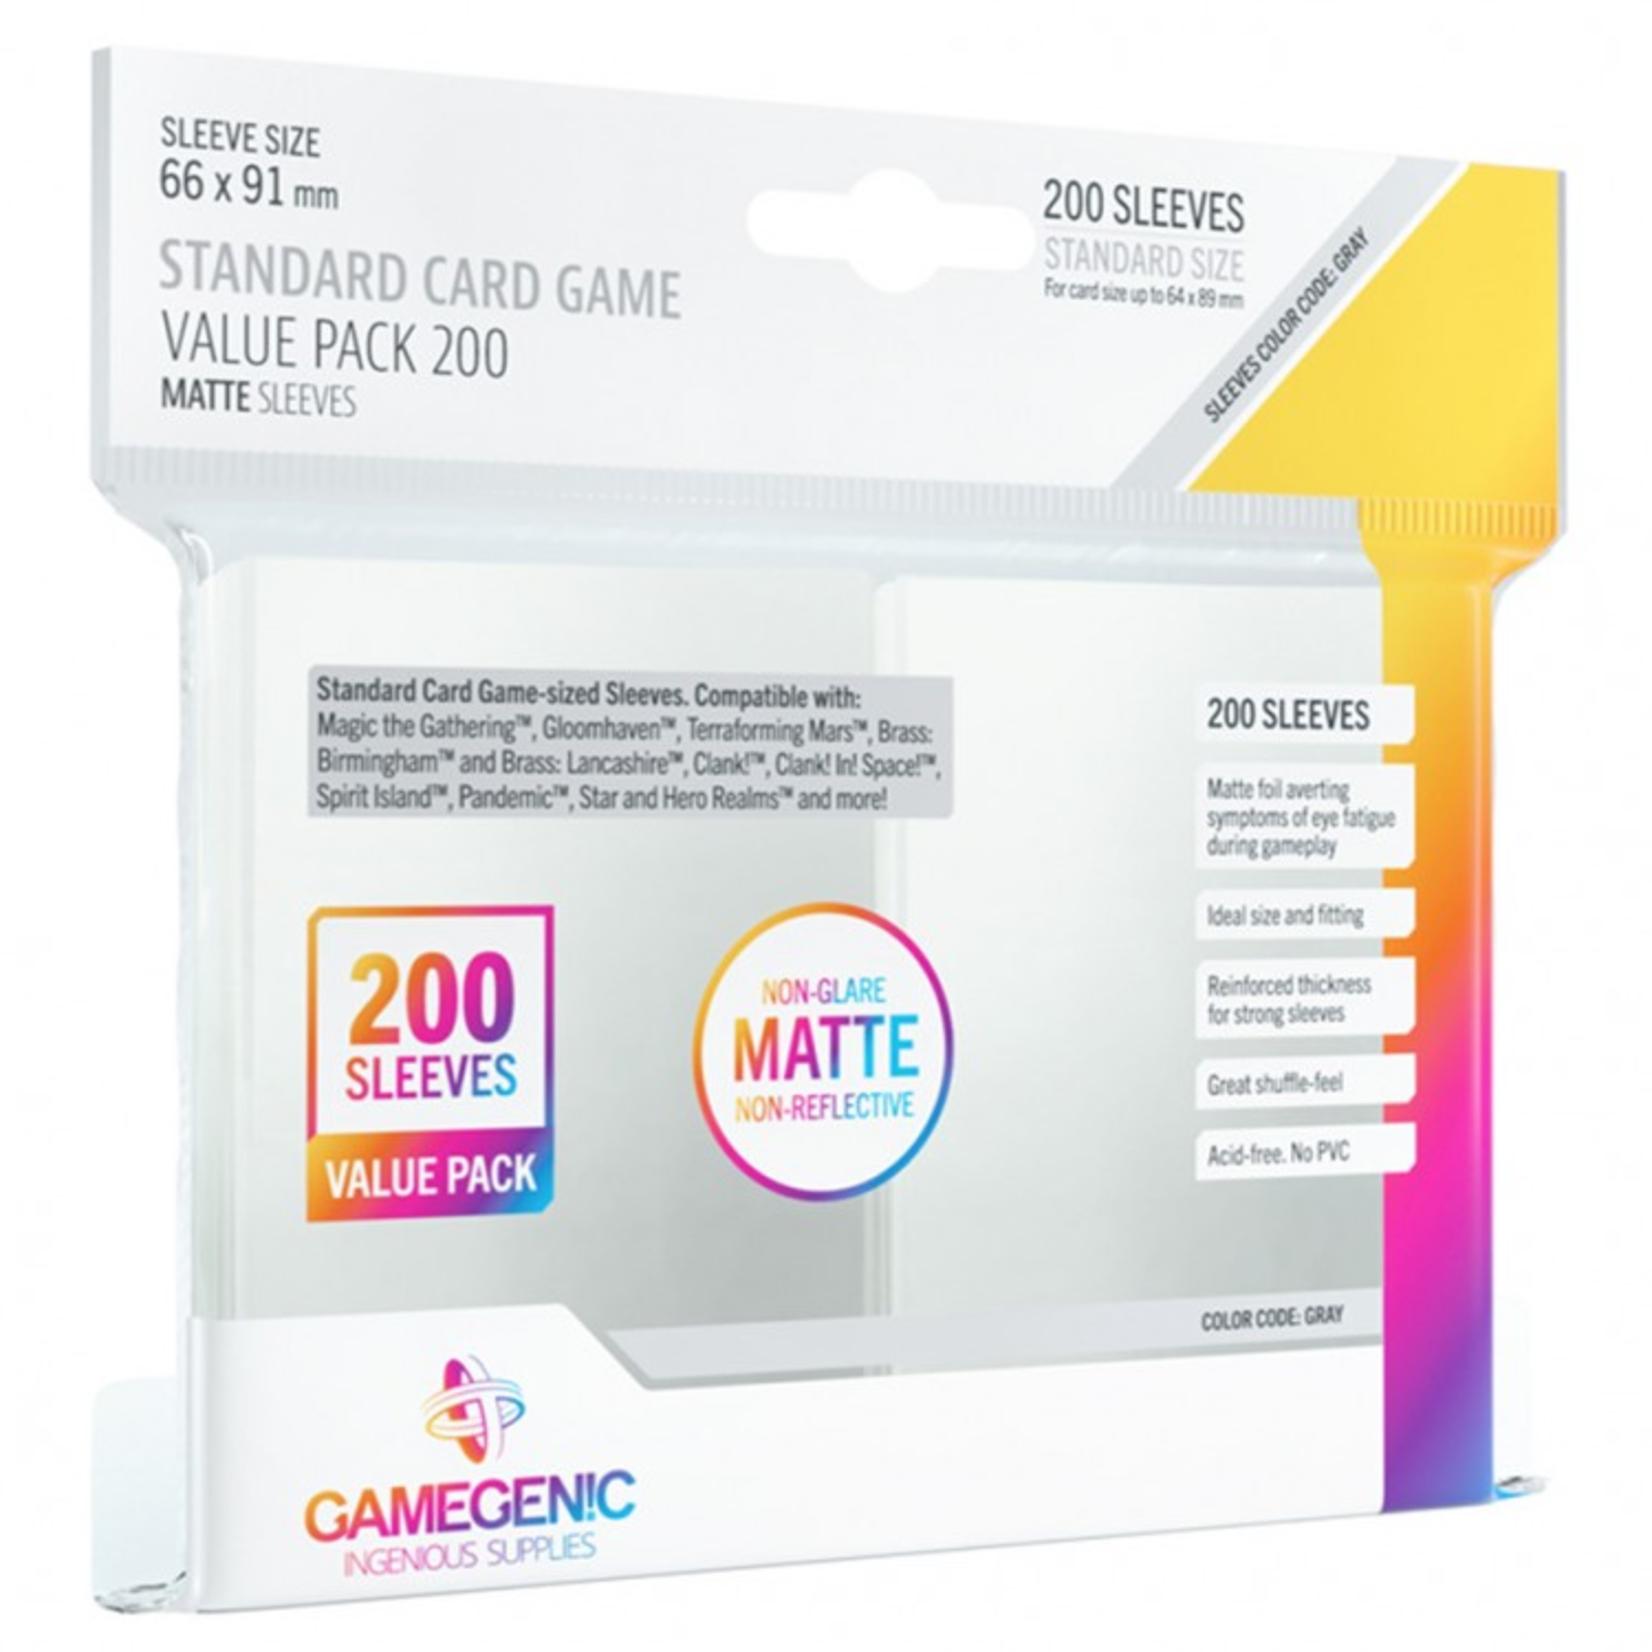 Gamegenic GameGenic: Standard Card Game Sleeves Matte (200)